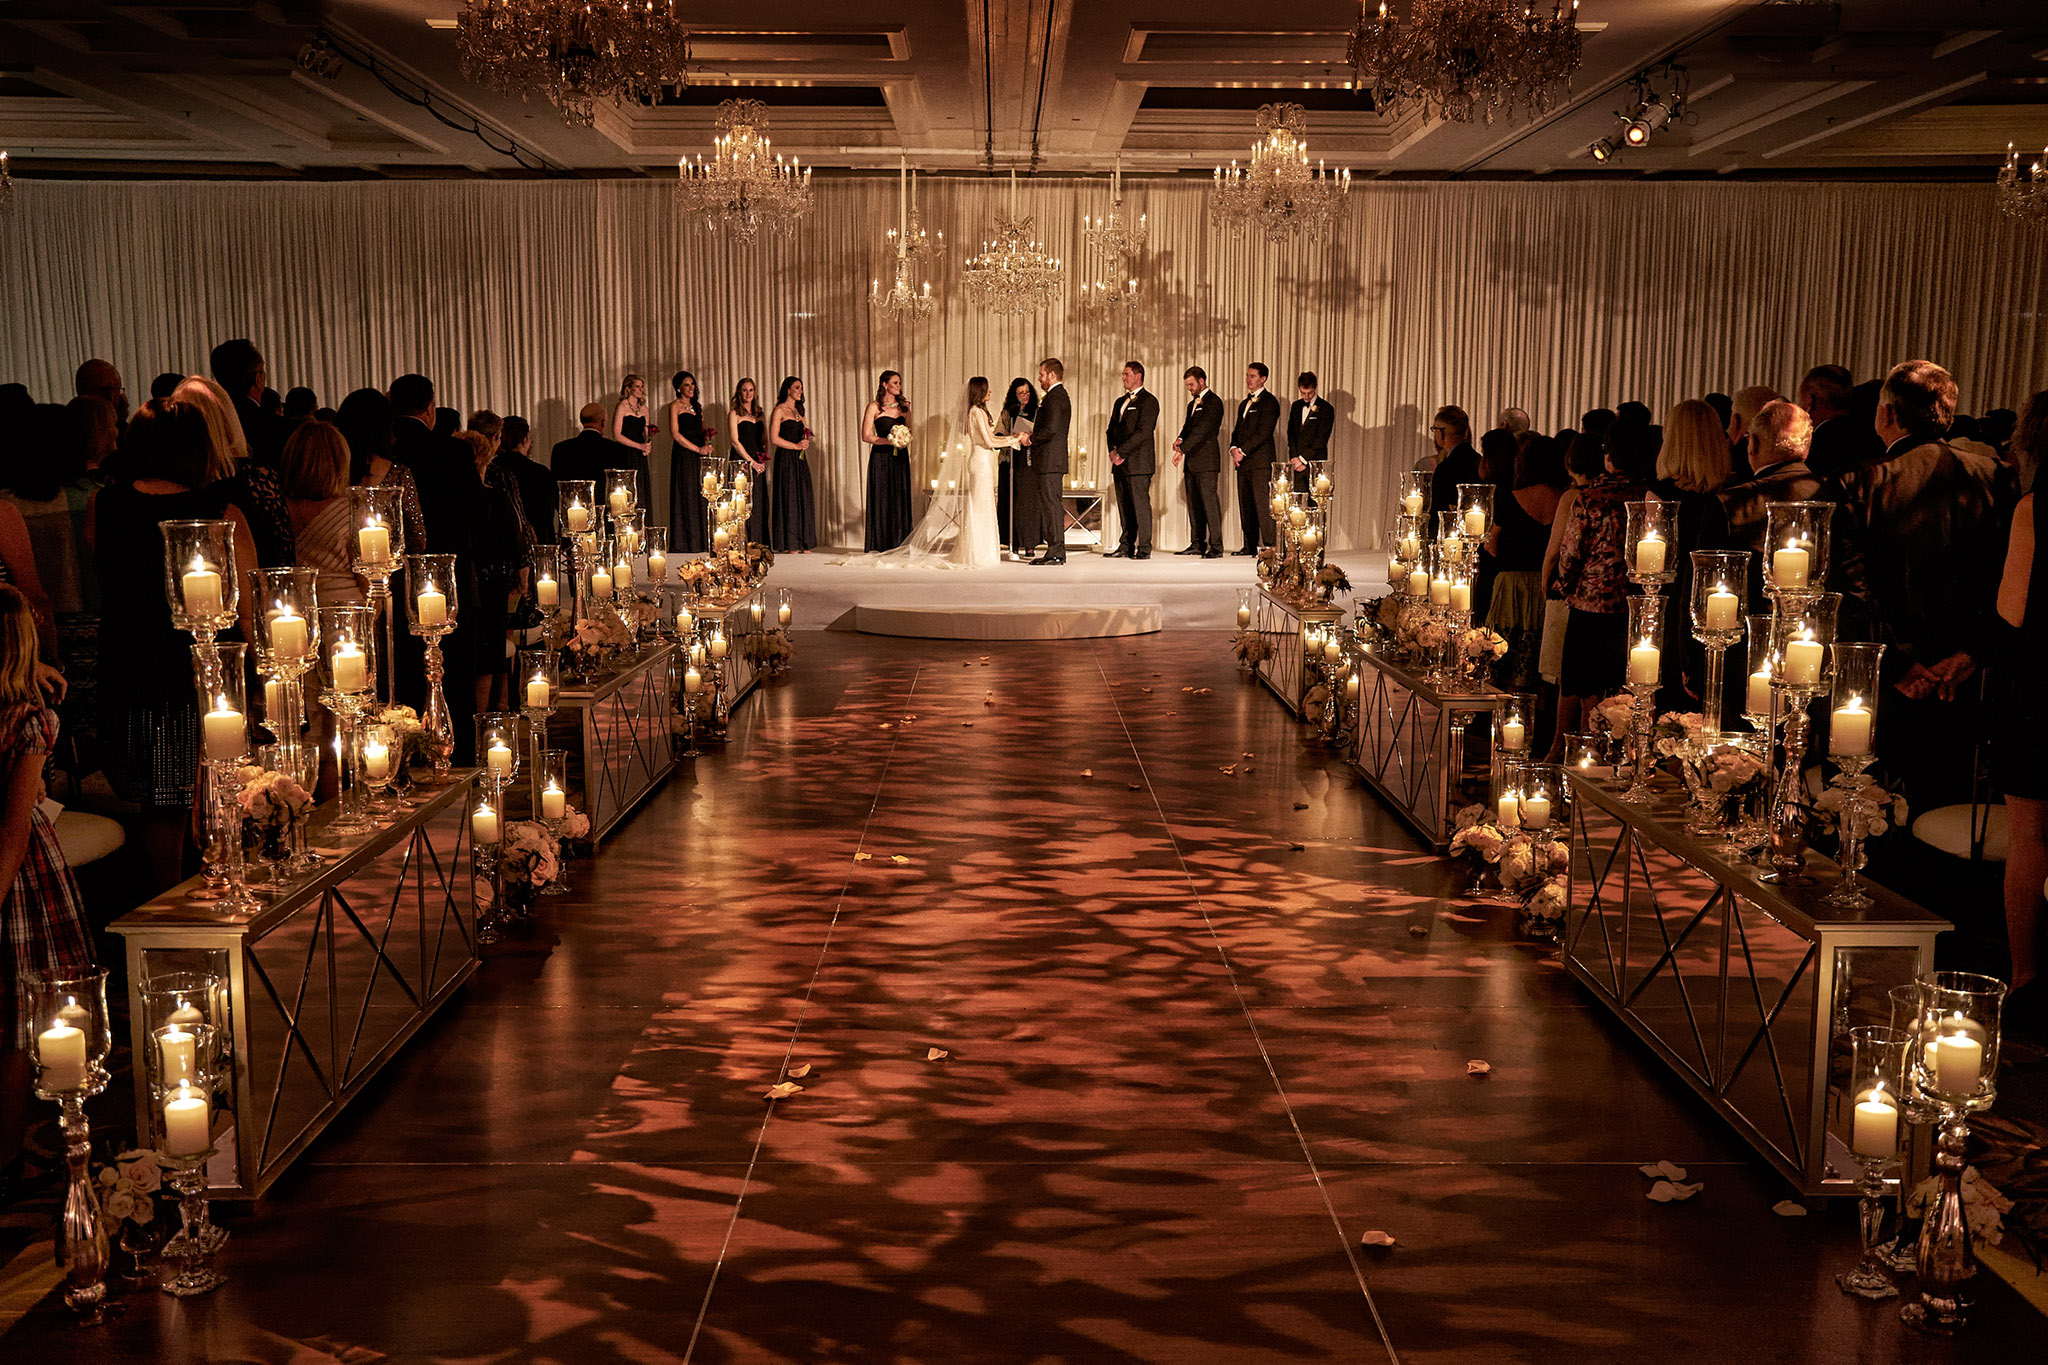 Wedding Ideas: 10 Ways To Decorate Your Ceremony Aisle